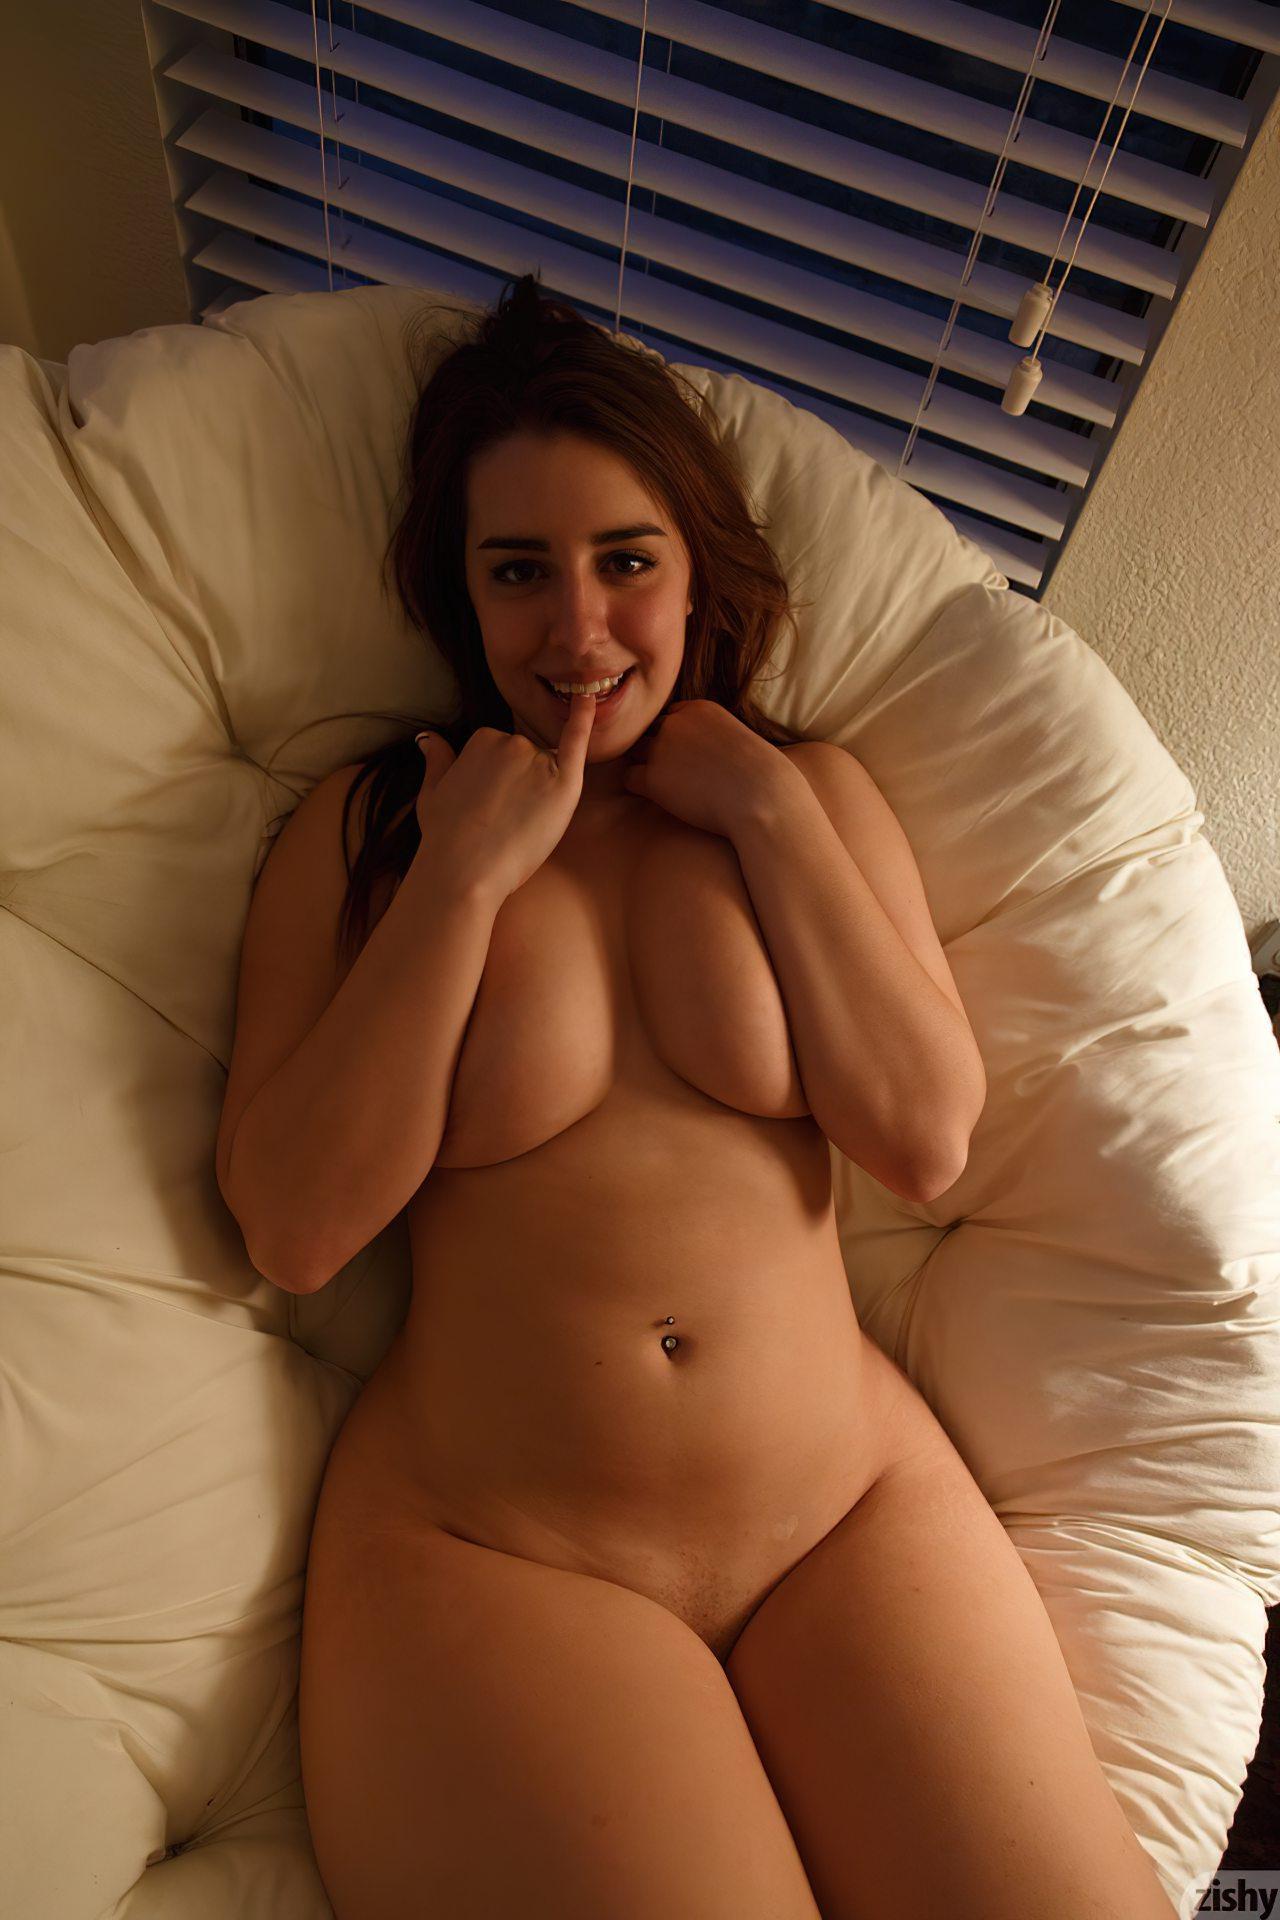 Mulheres Despidas Fotos (43)